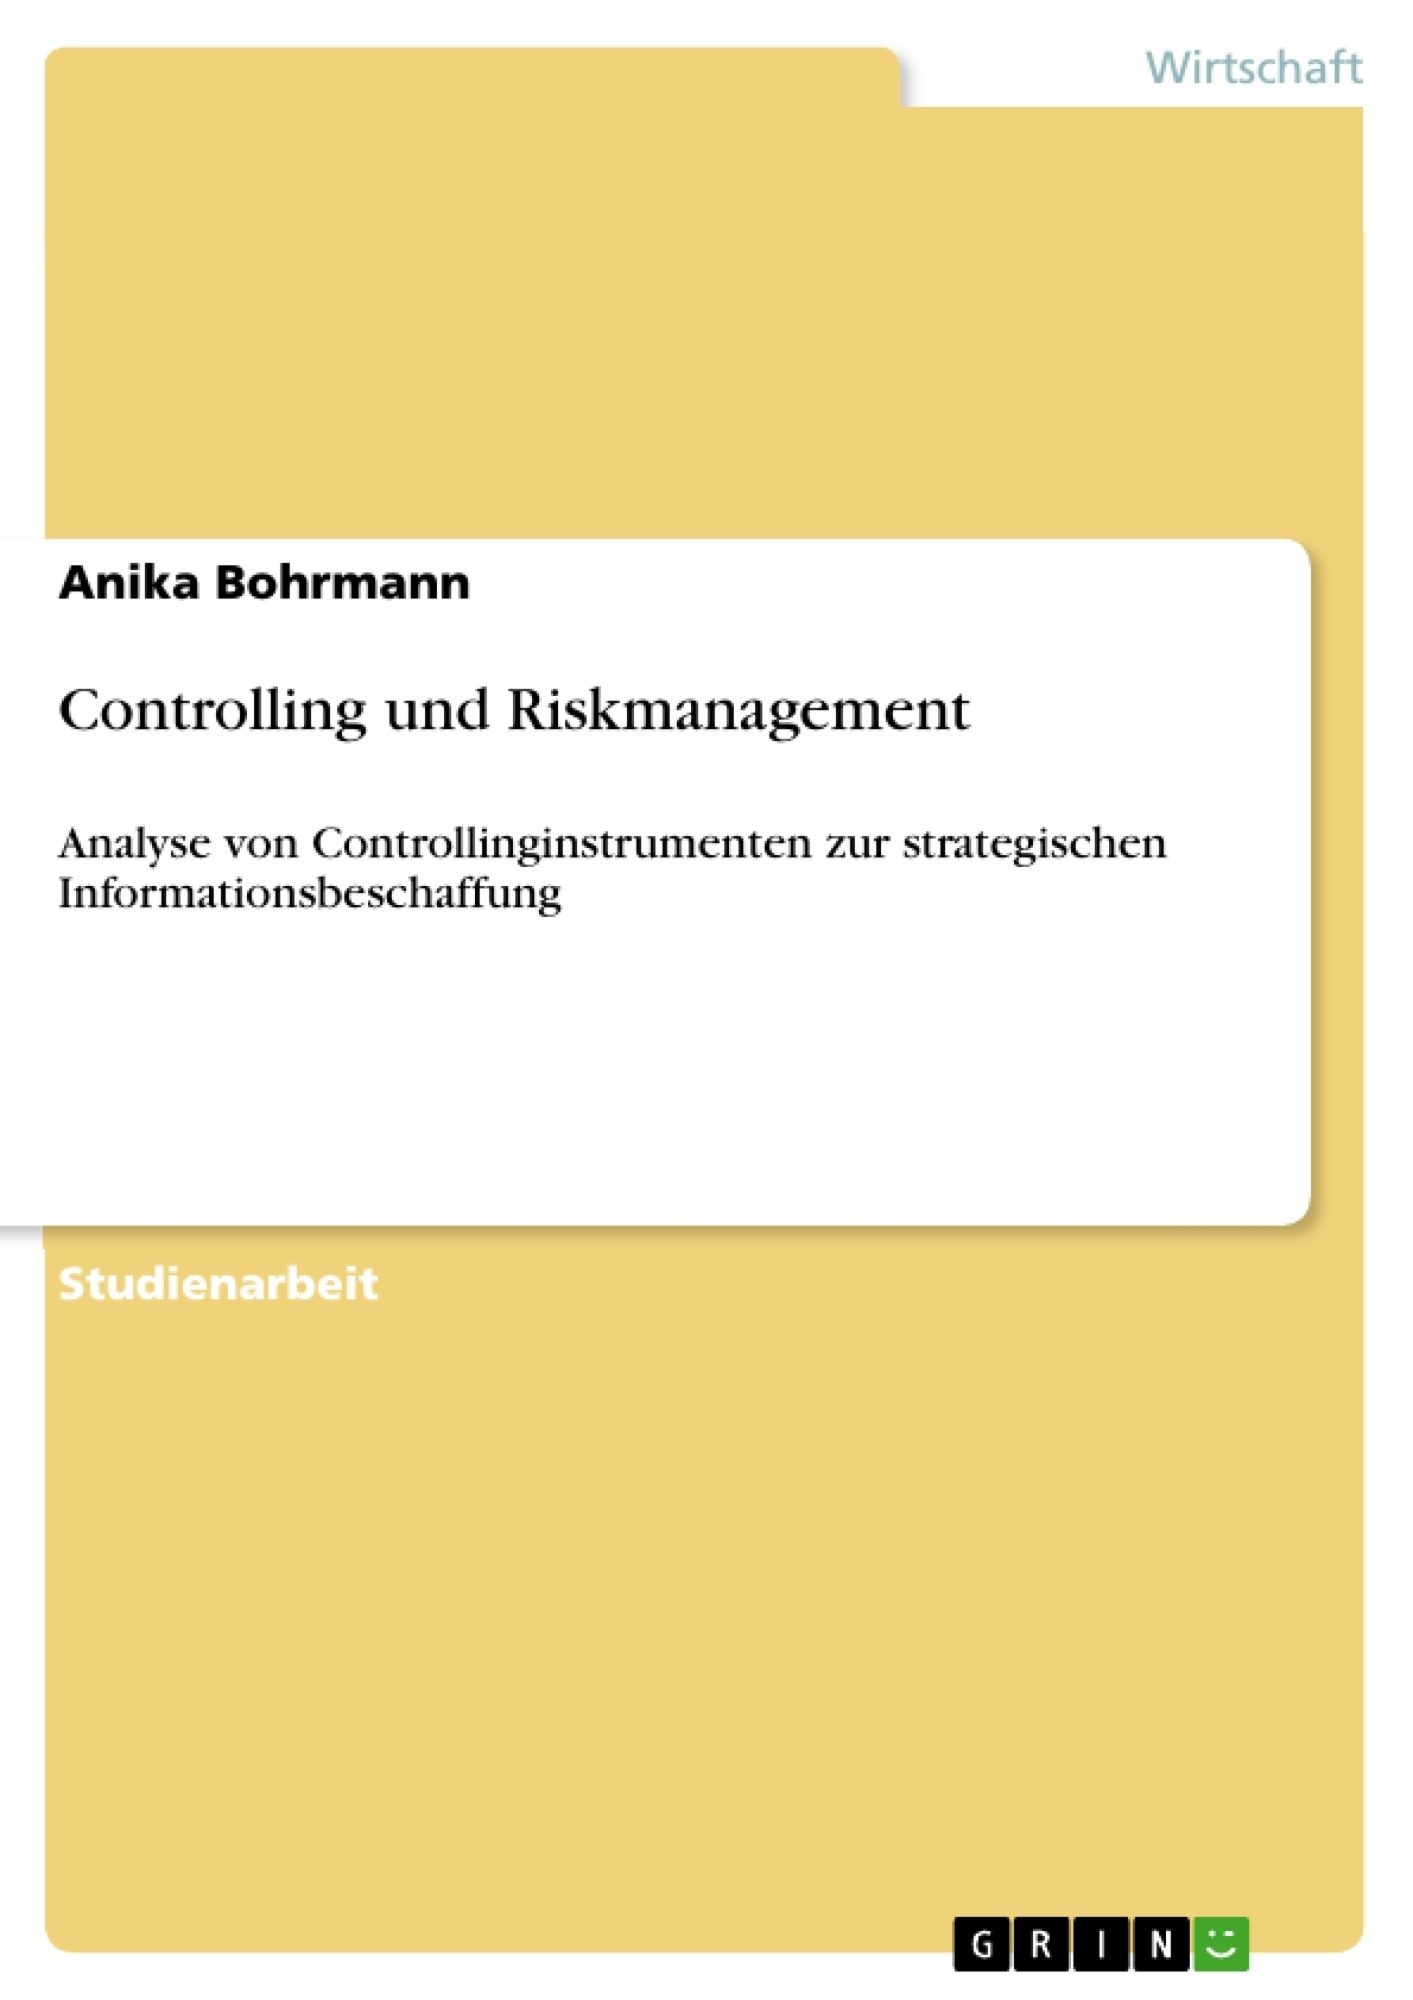 Titel: Controlling und Riskmanagement